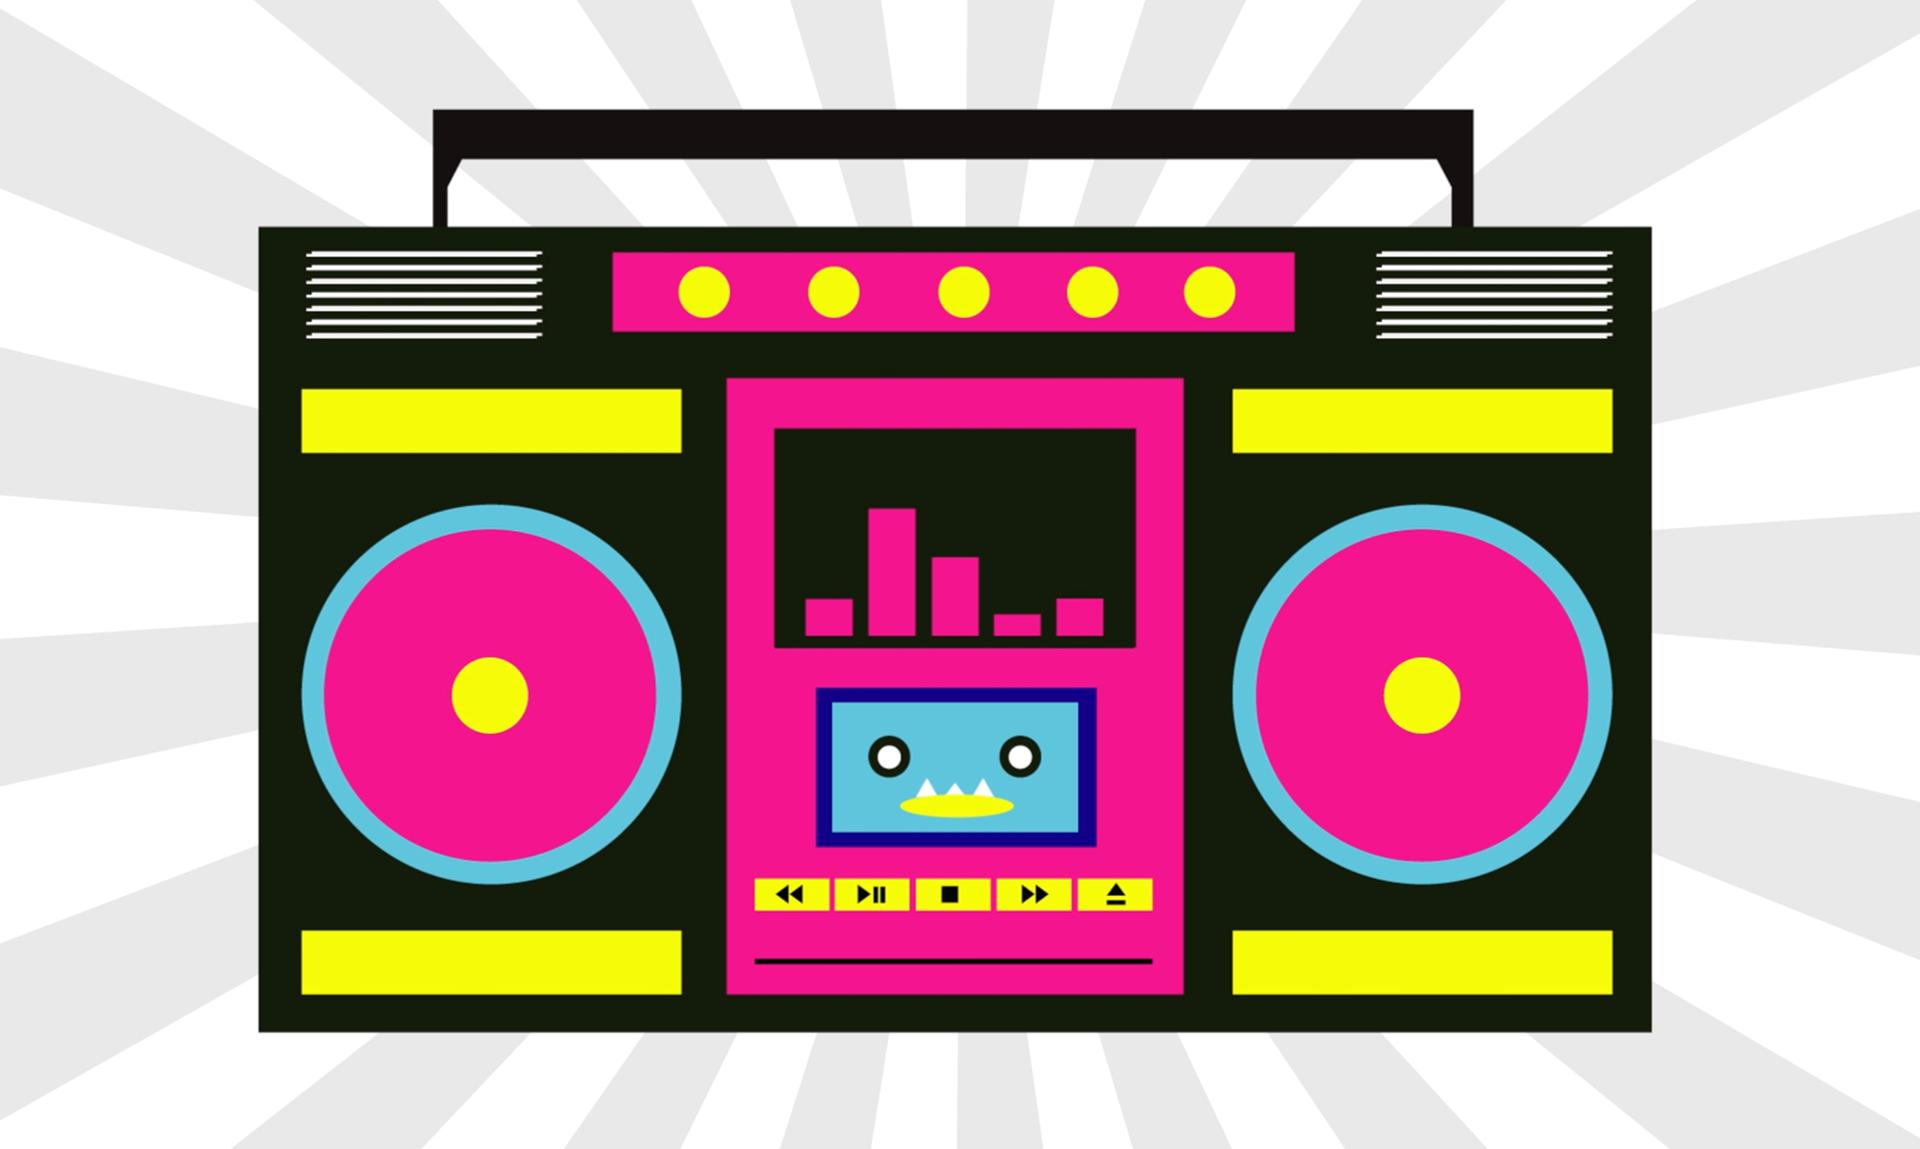 Boom box free download. Boombox clipart pink radio